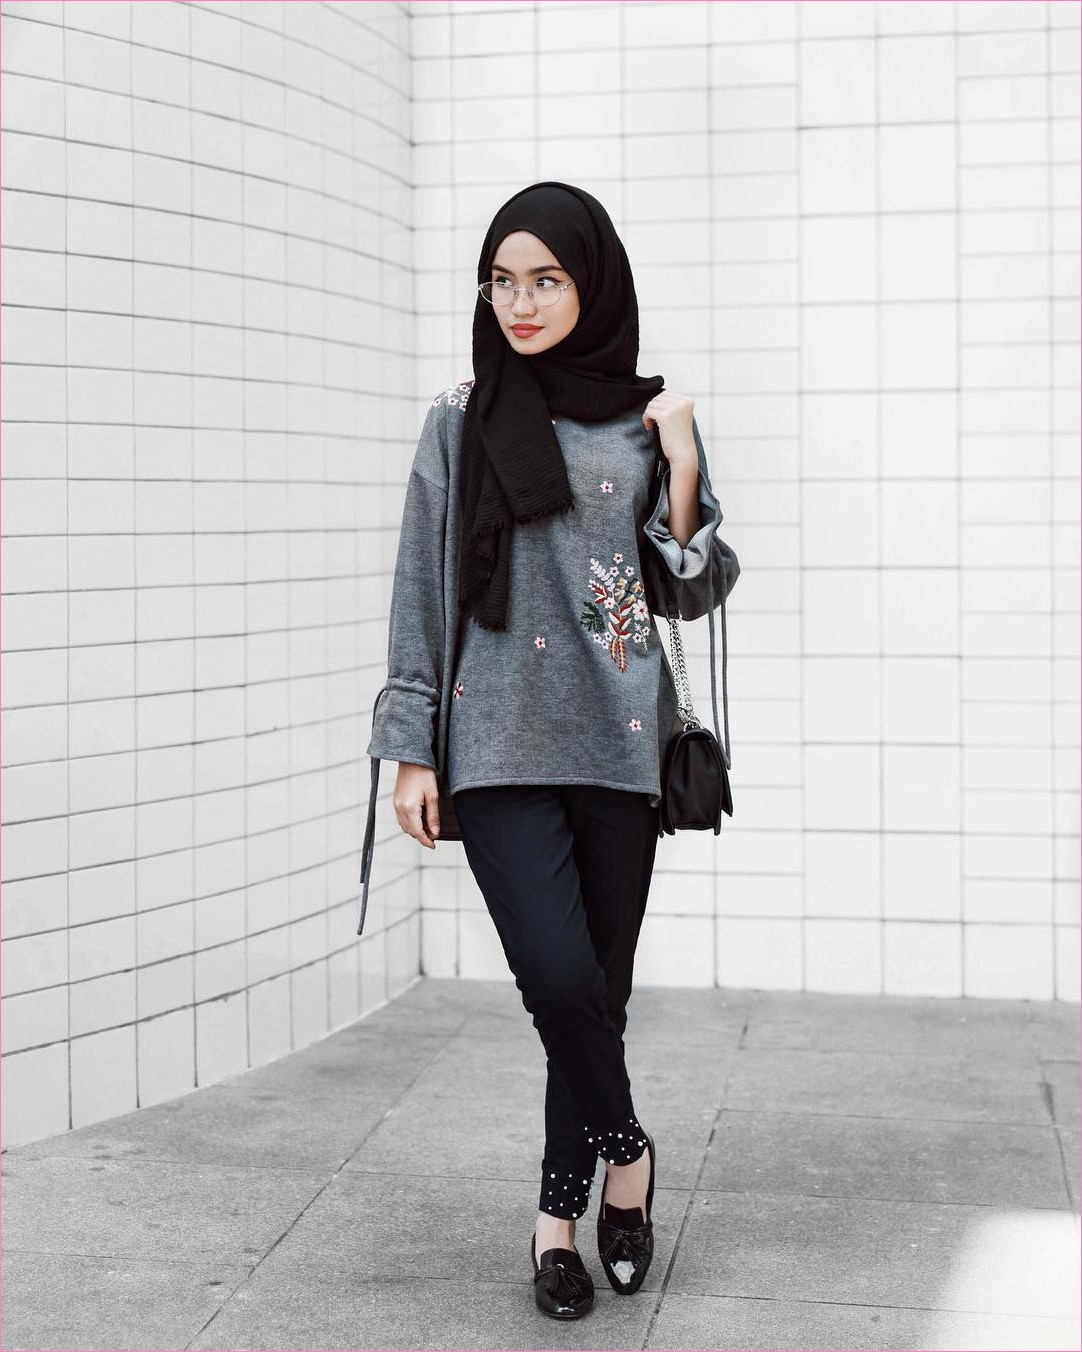 Outfit Kerudung Pashmina Ala Selebgram 2018 hijab pashmina rawis celana bahan hitam legging slingbags flatshoes loafers and slip ons baju top kemeja blouse abu tua kacamata ootd trendy kekinian hijabers tembok keramik putih